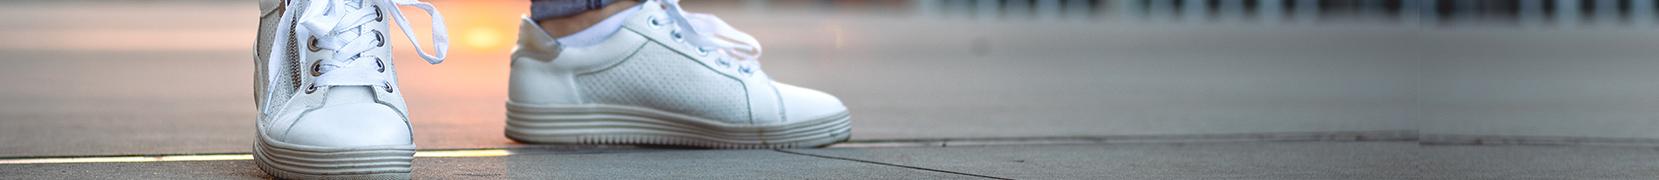 1659x180_Schuhe